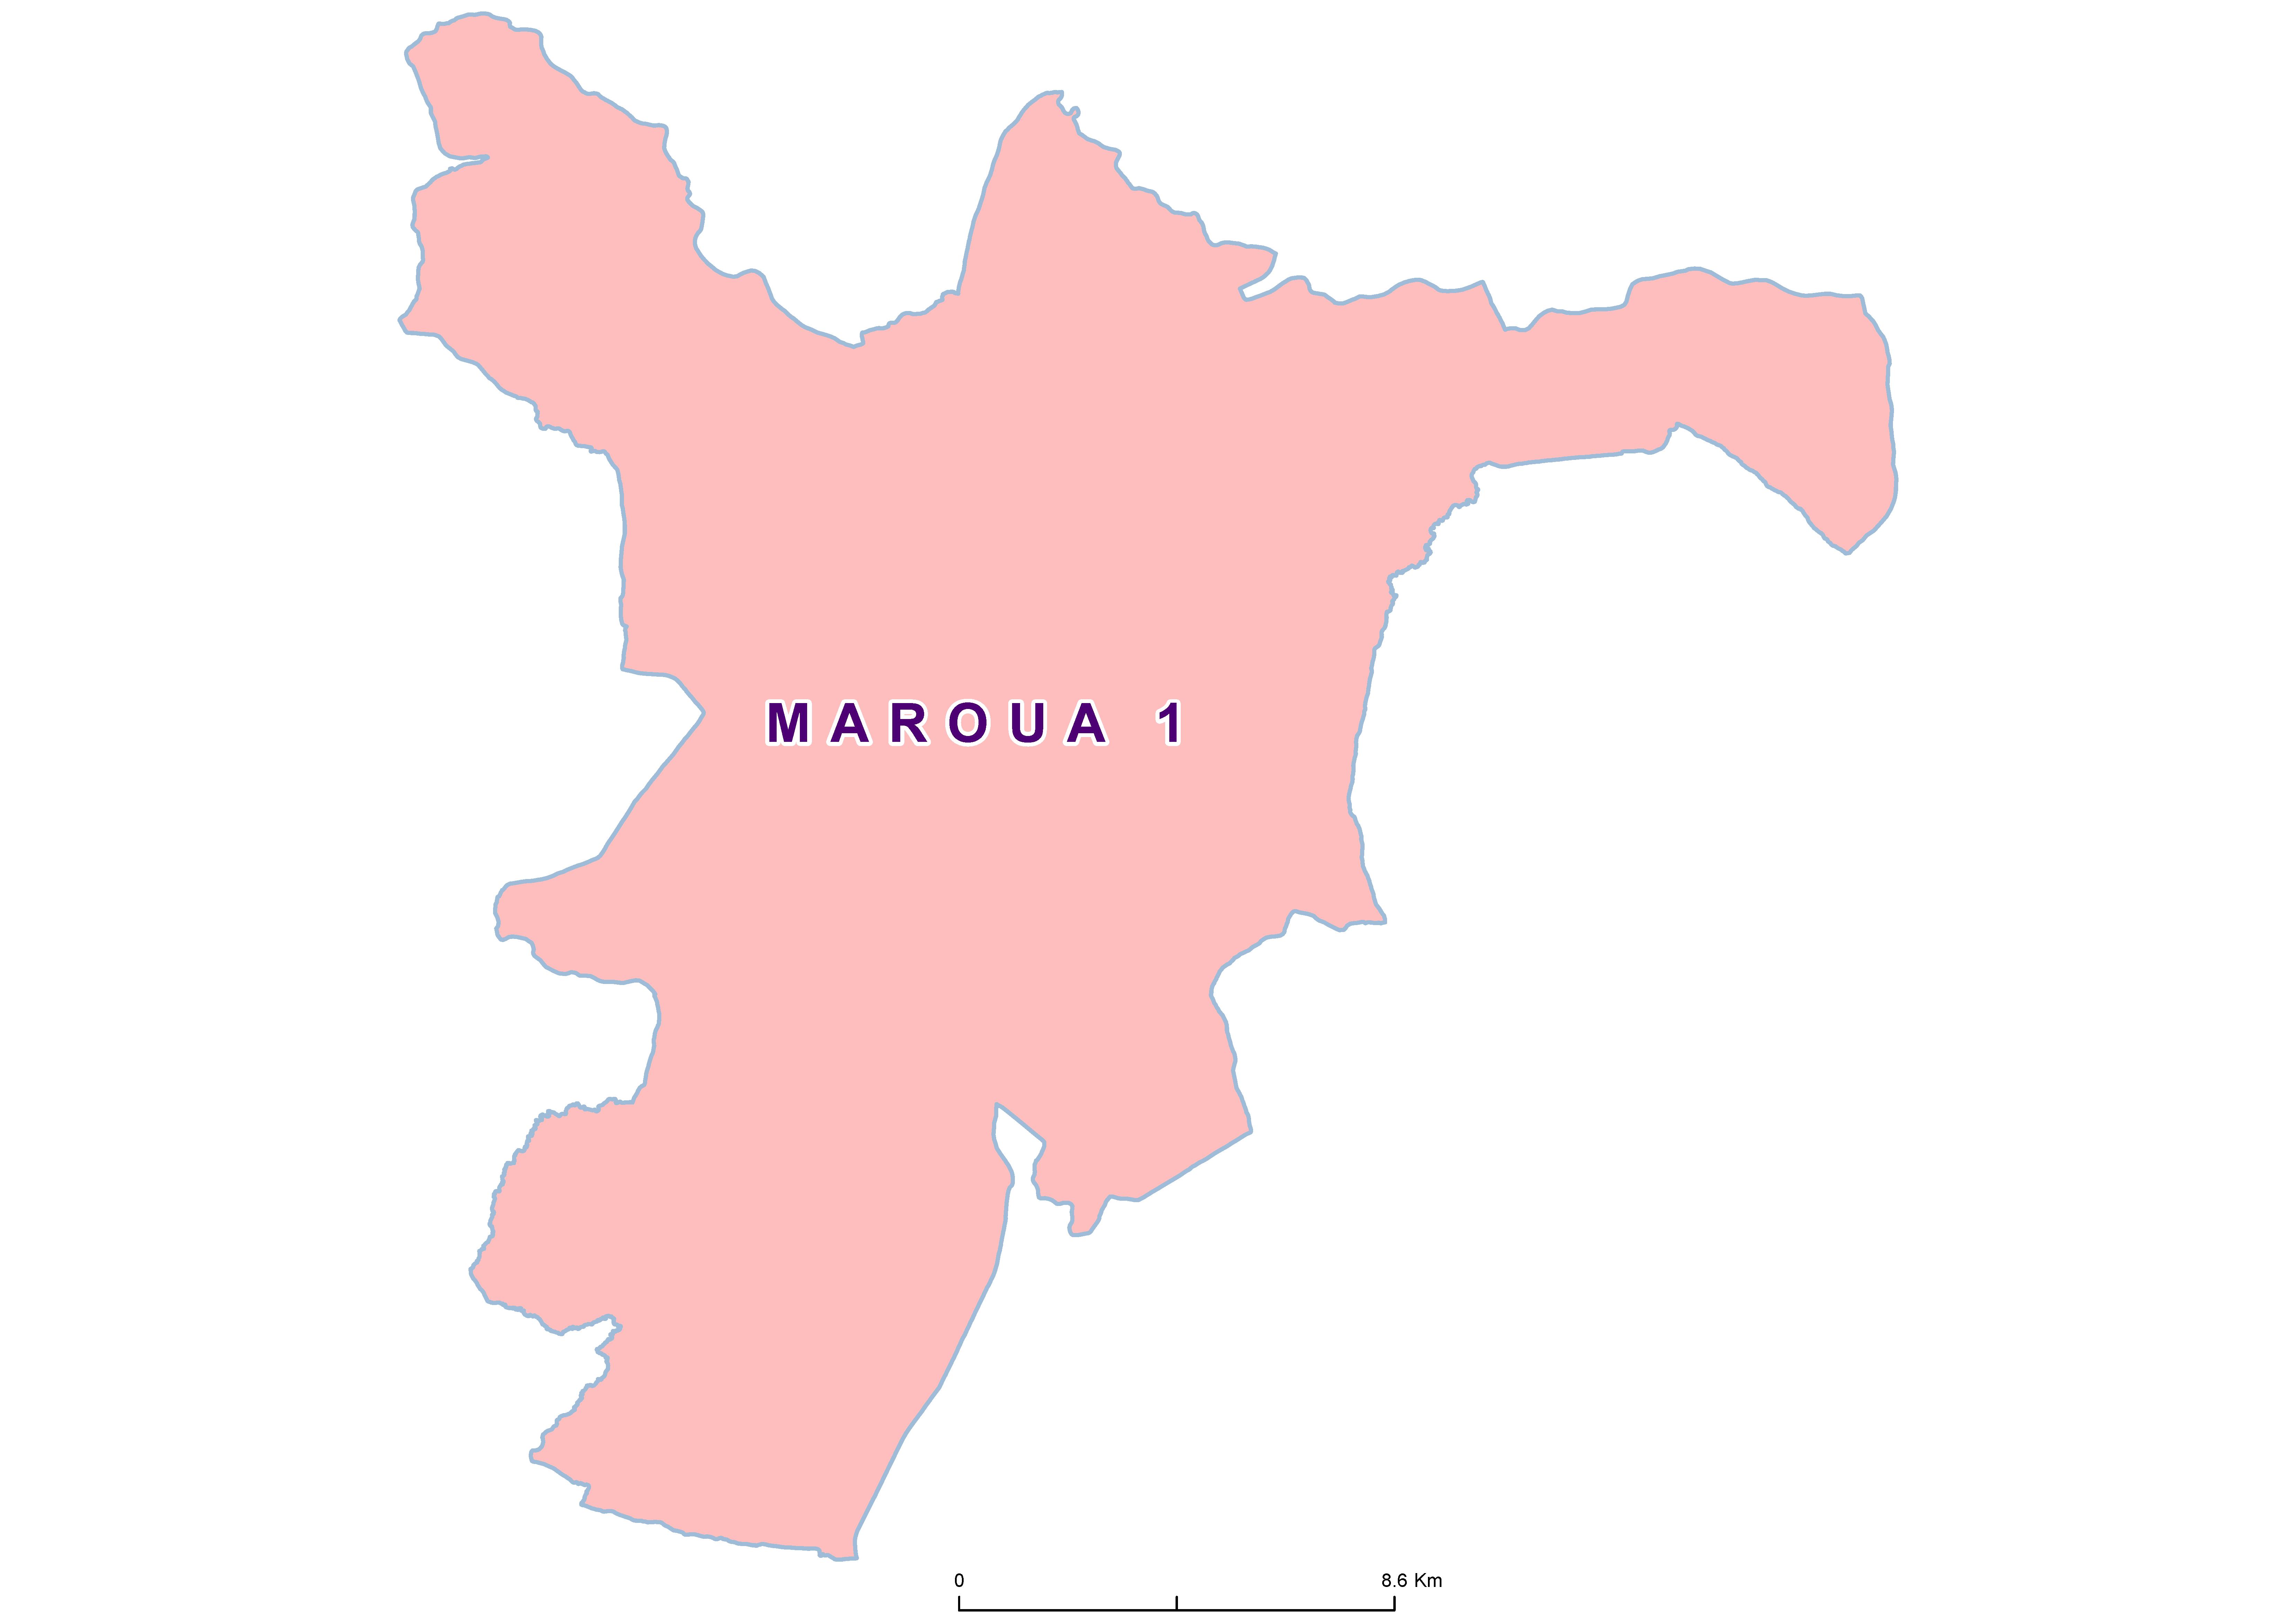 Maroua 1 Mean SCH 19850001